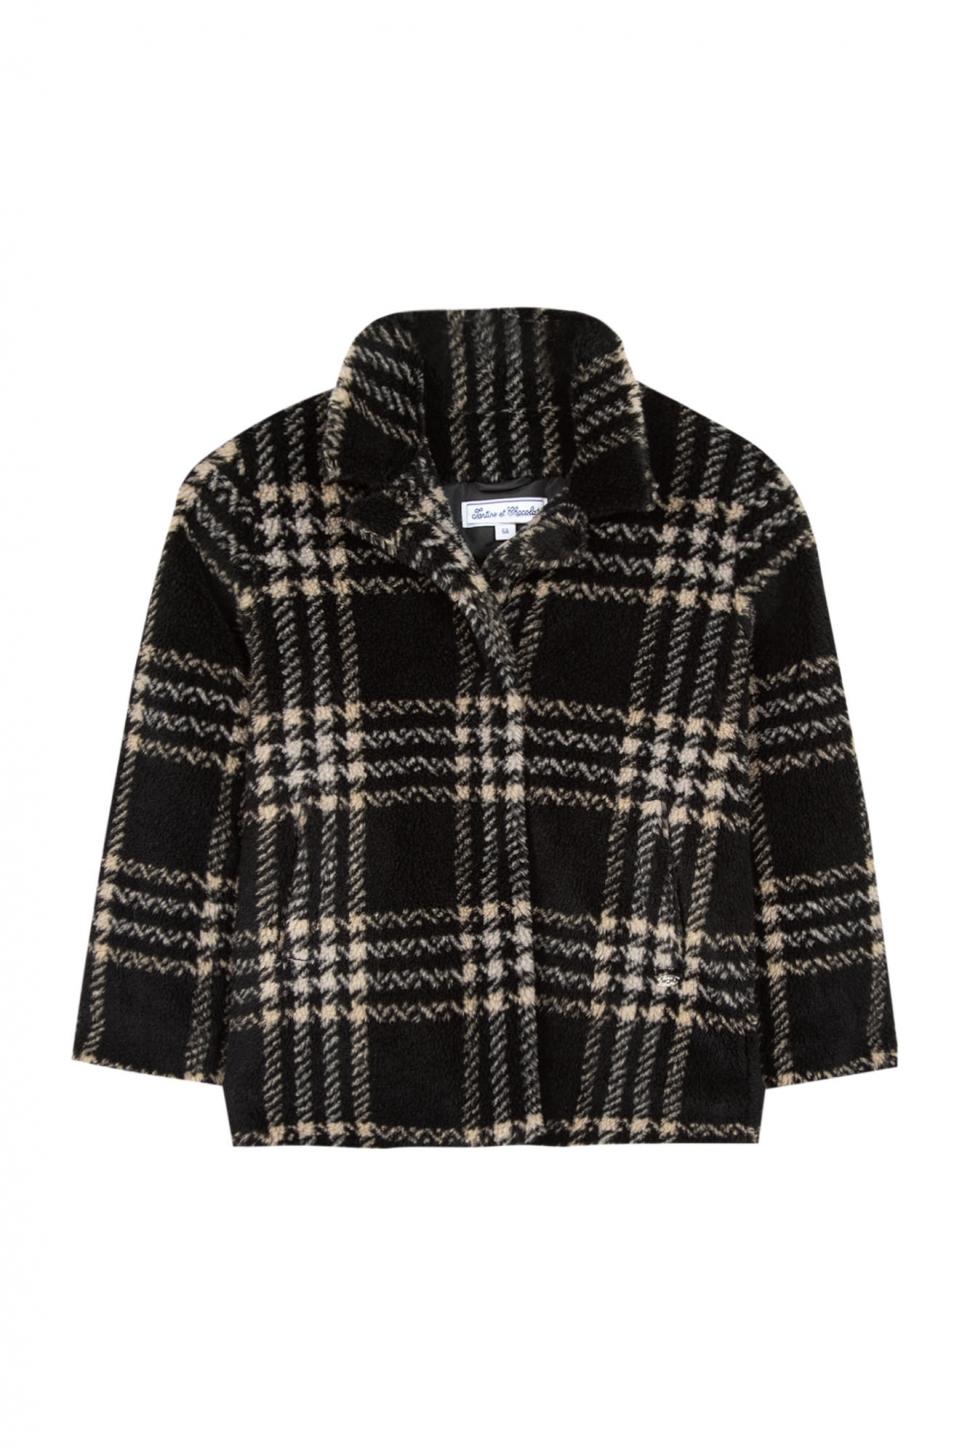 manteau-fourrure-carreaux-noir-tartine-et-chocolat